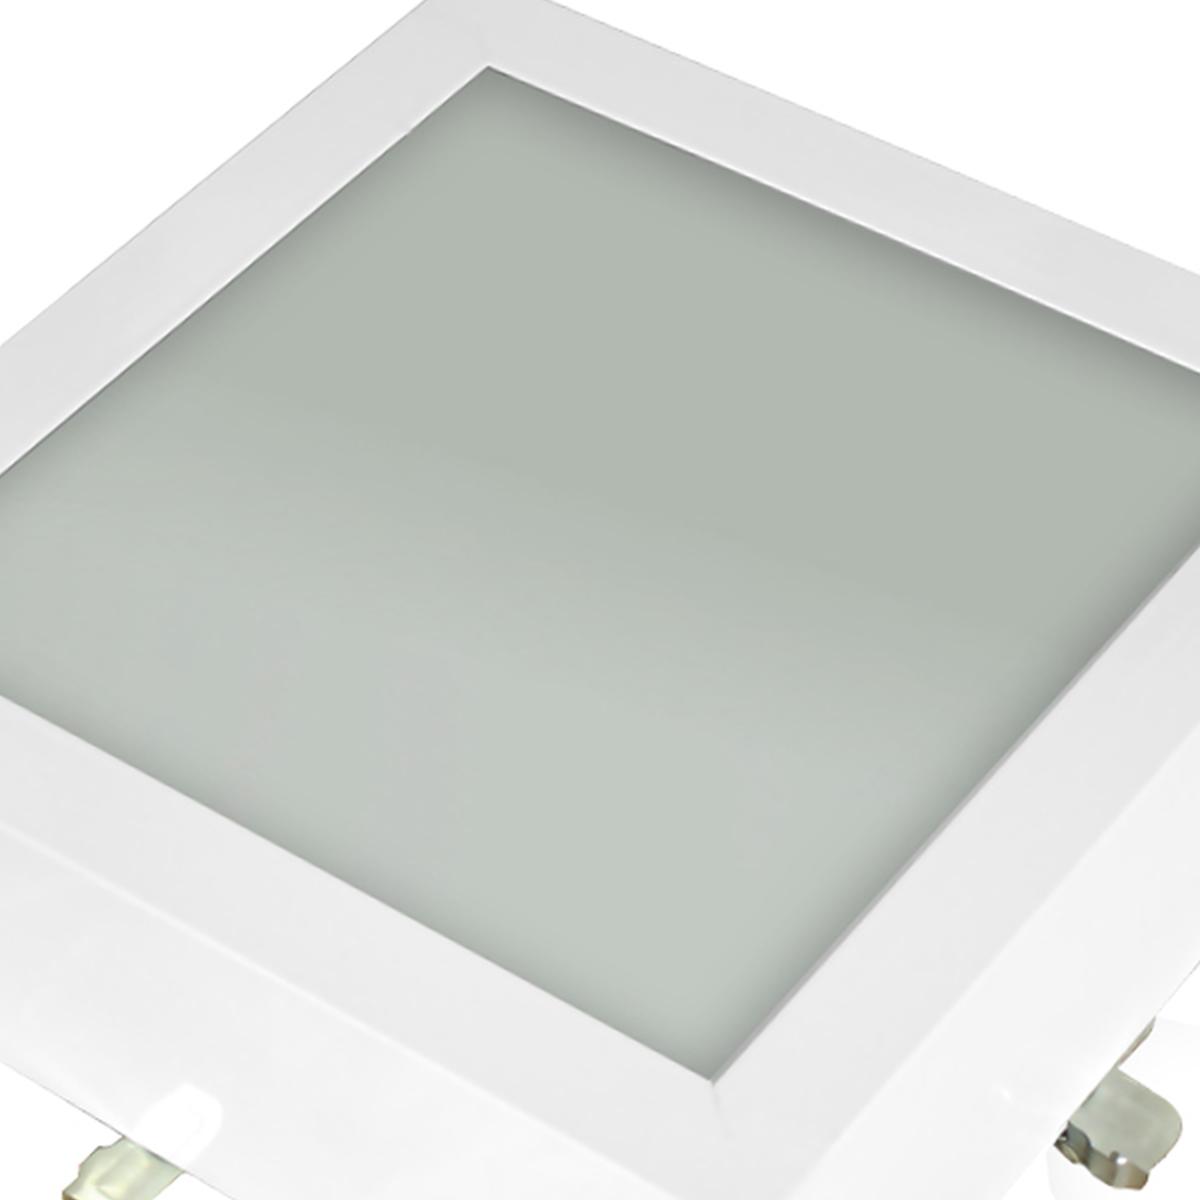 Plafon Space Sobr. Quad. 20cm Alum. Vidro Fosco E-27 1 Lamp. Max 60w Branco